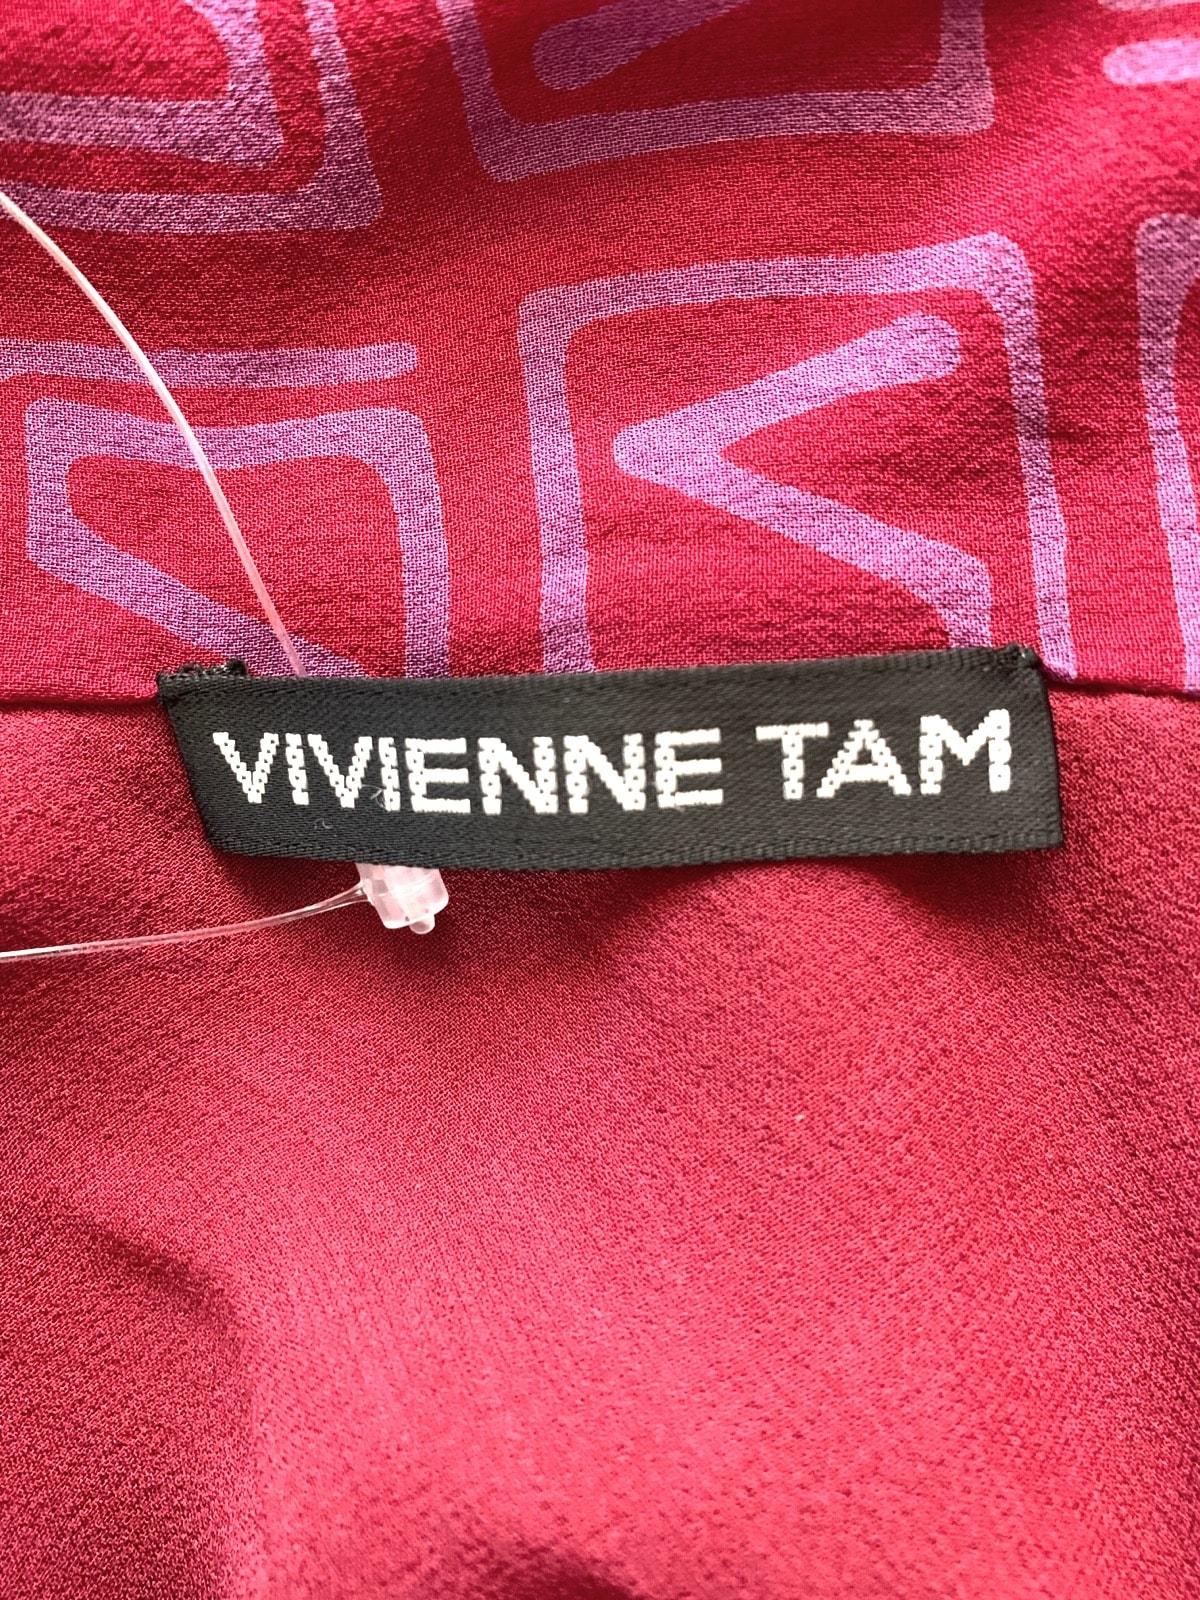 VIVIENNE TAM(ヴィヴィアンタム)のチュニック